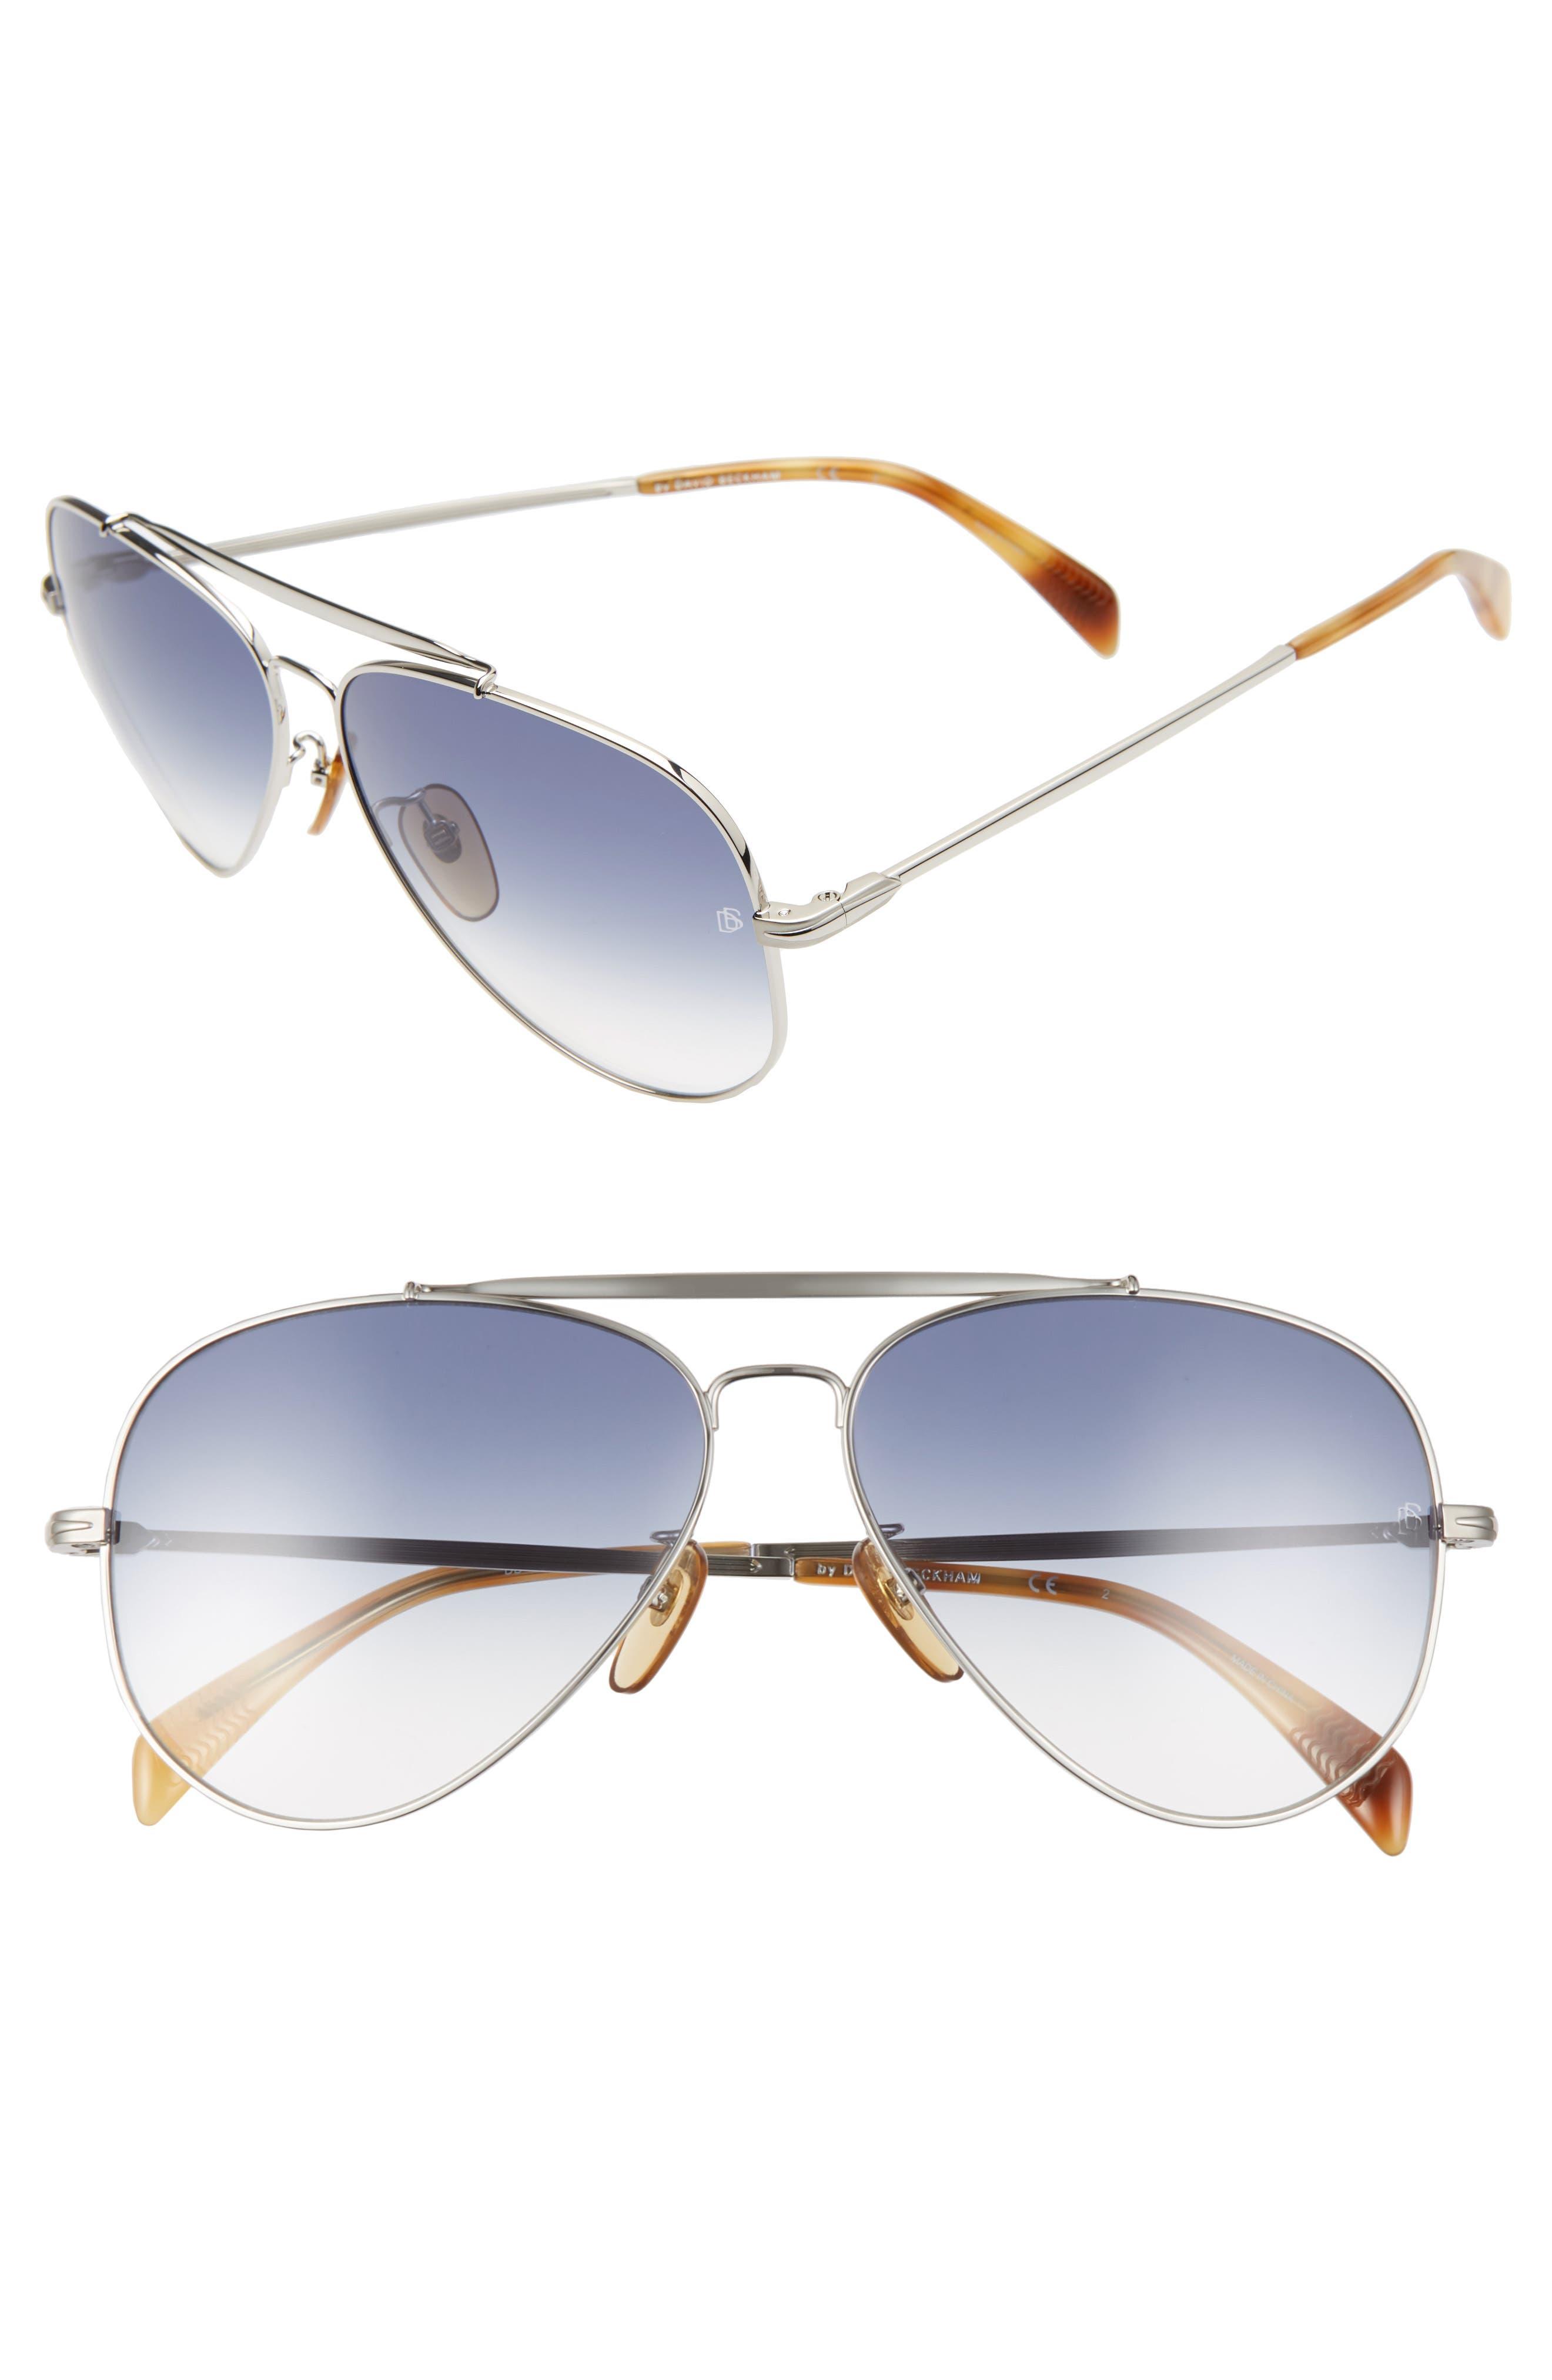 Men's Eyewear By David Beckham Db 1004/s 62mm Oversize Aviator Sunglasses